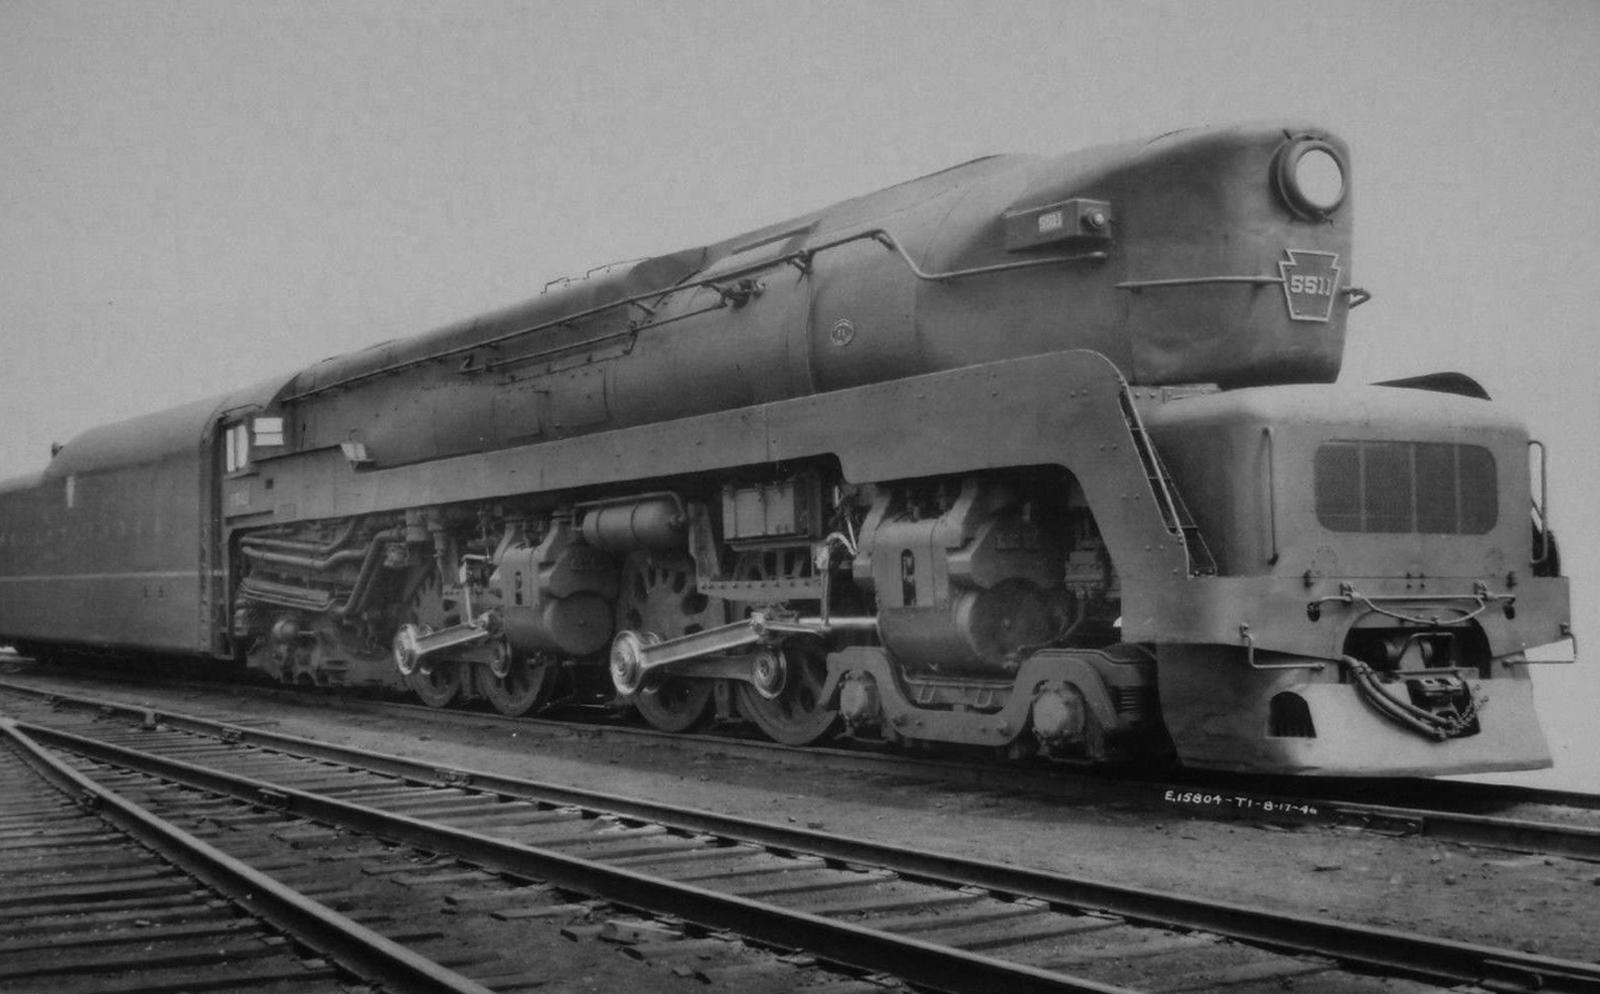 Pennsylvania Railroad T1 Steam Locomotive